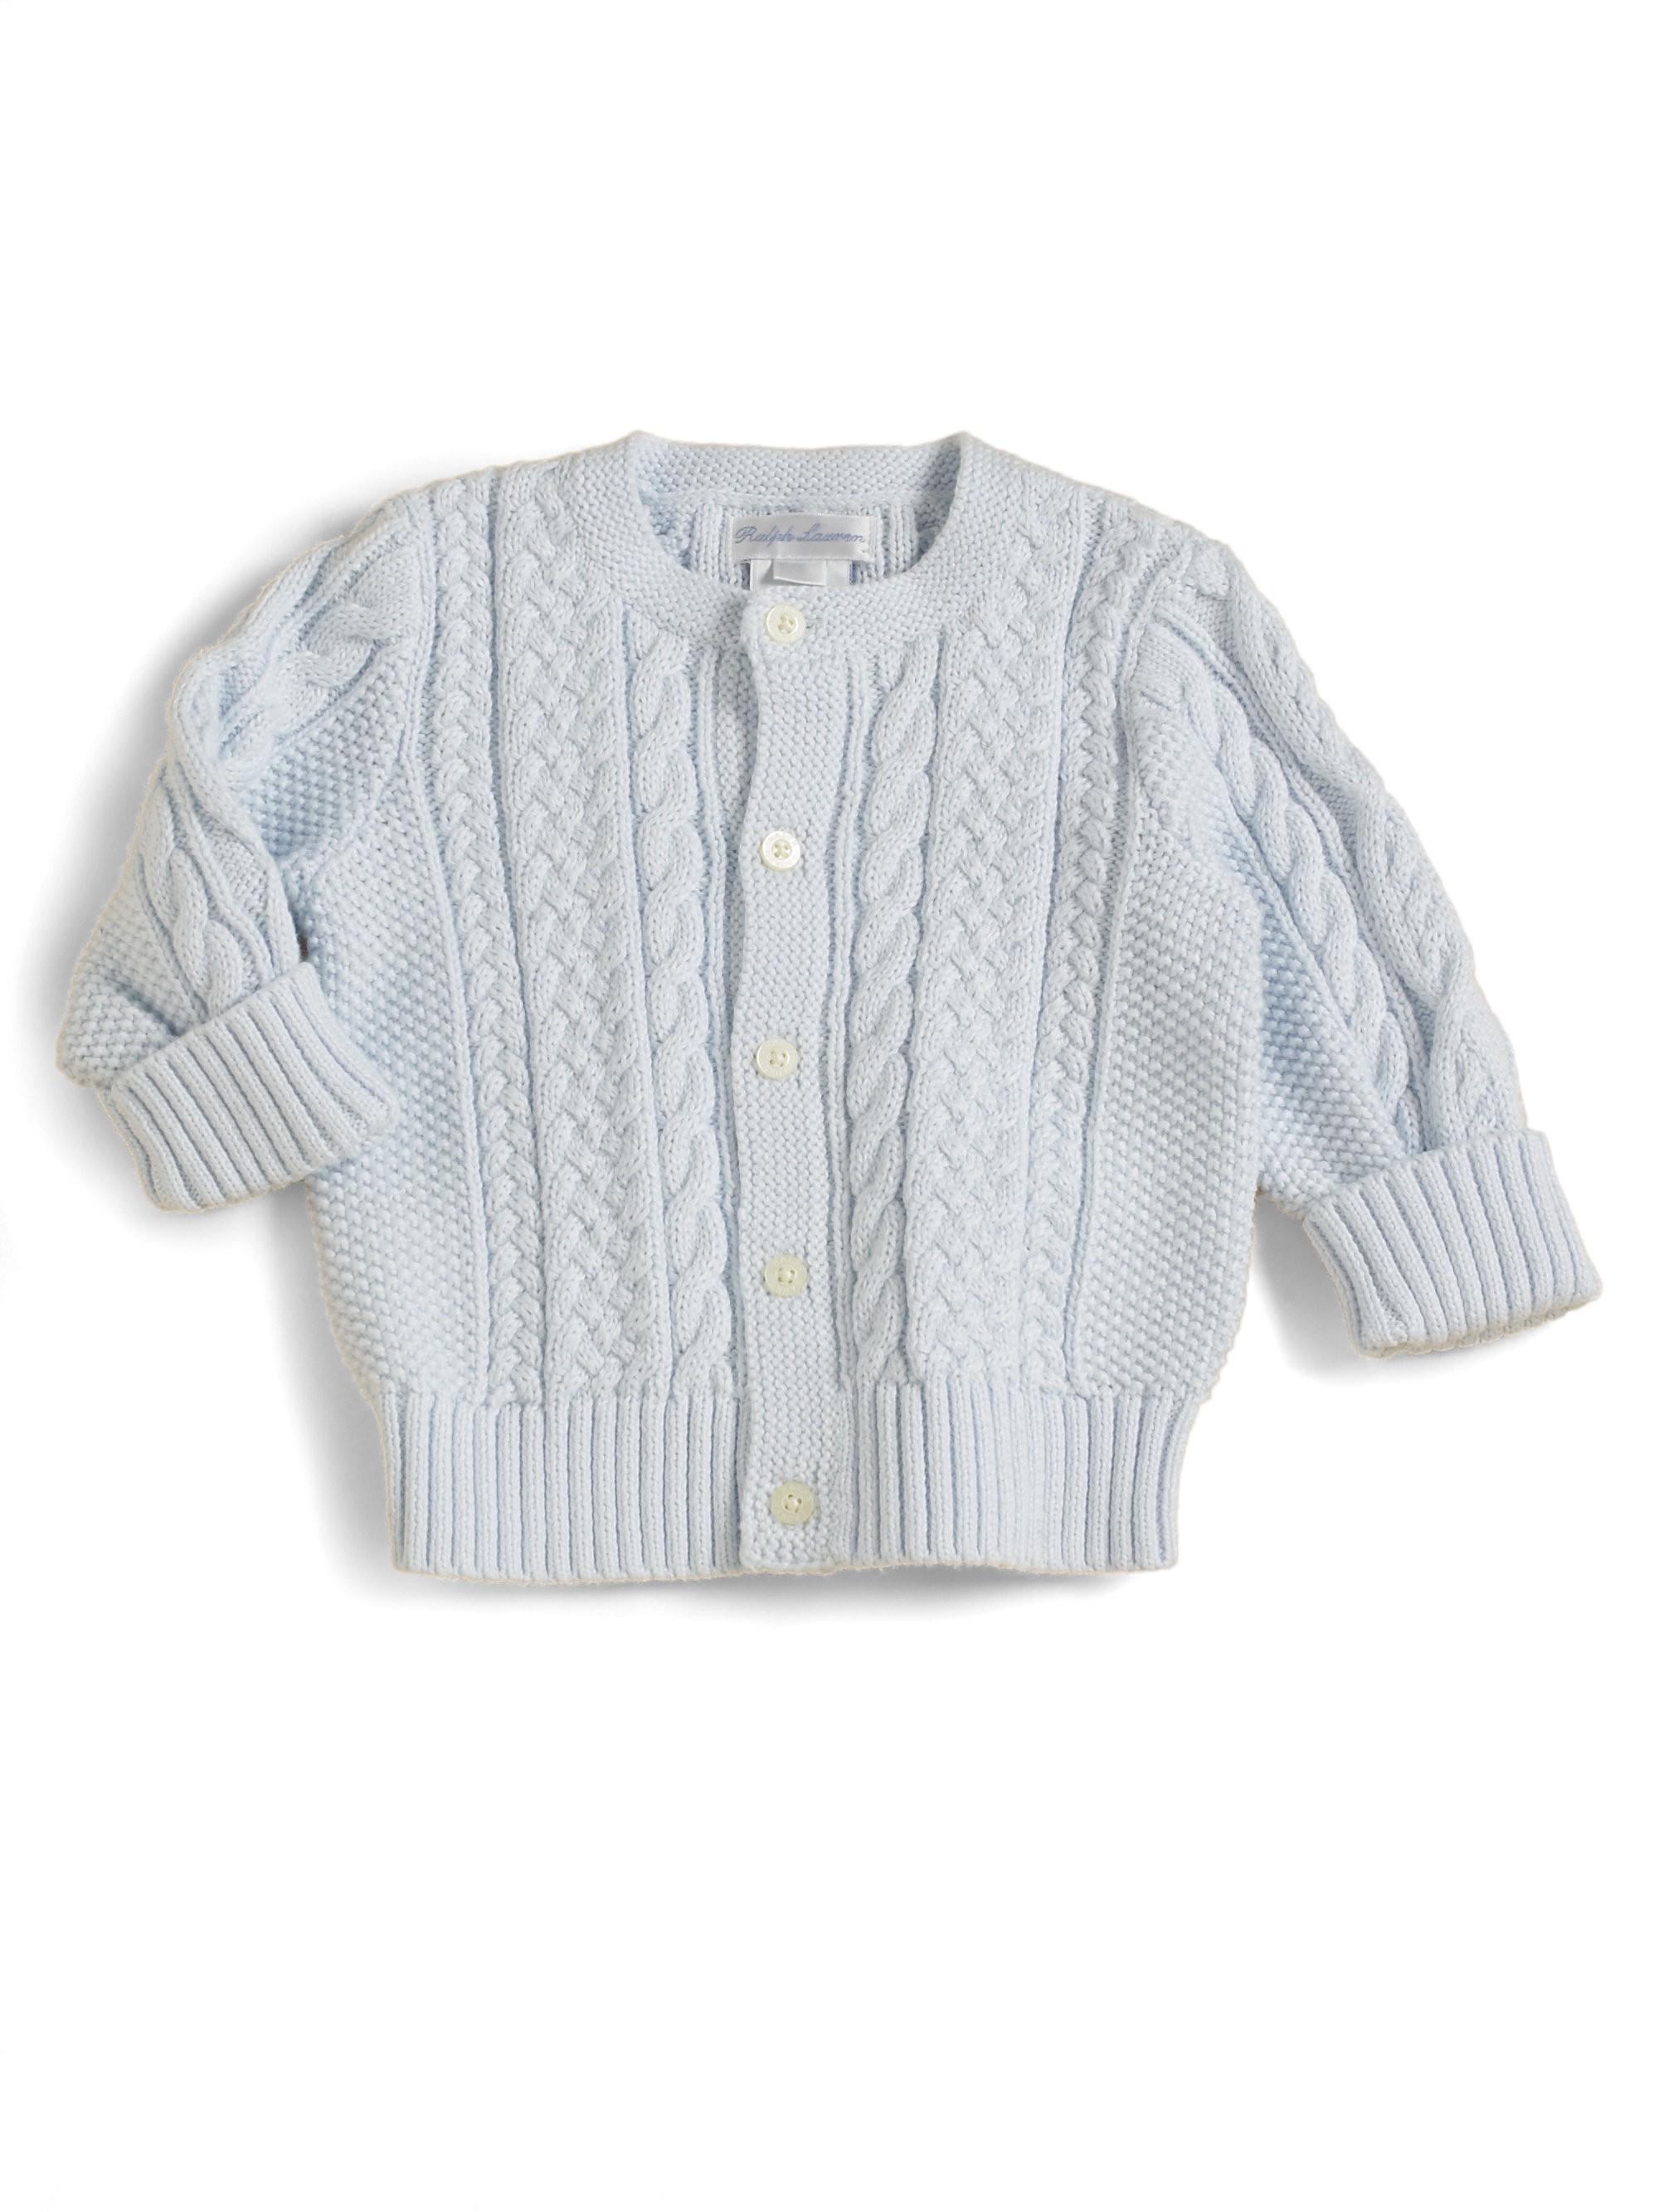 d628a784ed15 Infant s Mercerized Cotton Cardigan by Ralph Lauren in 2018 ...